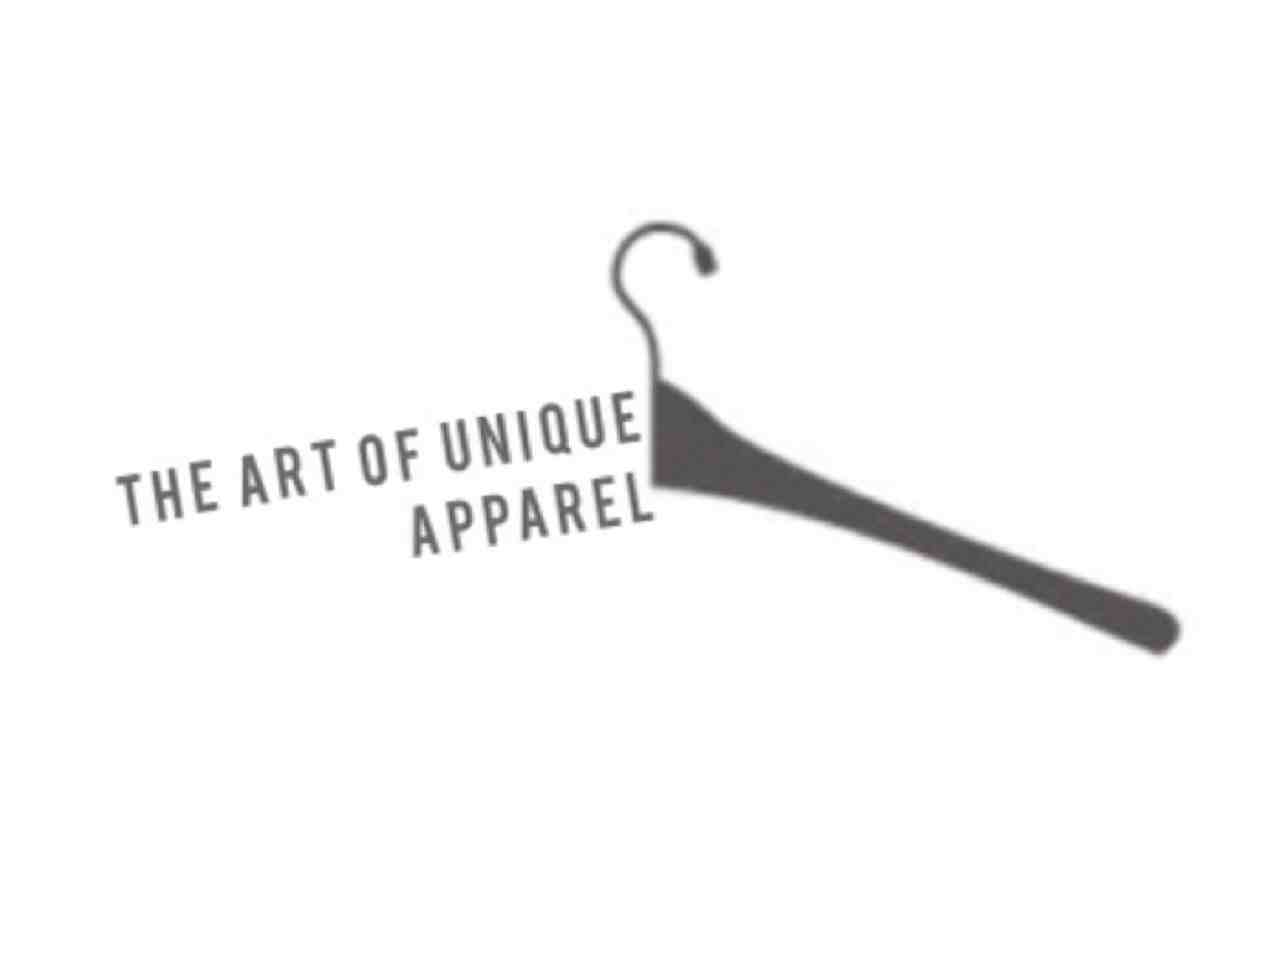 The Art Of Unique Apparel